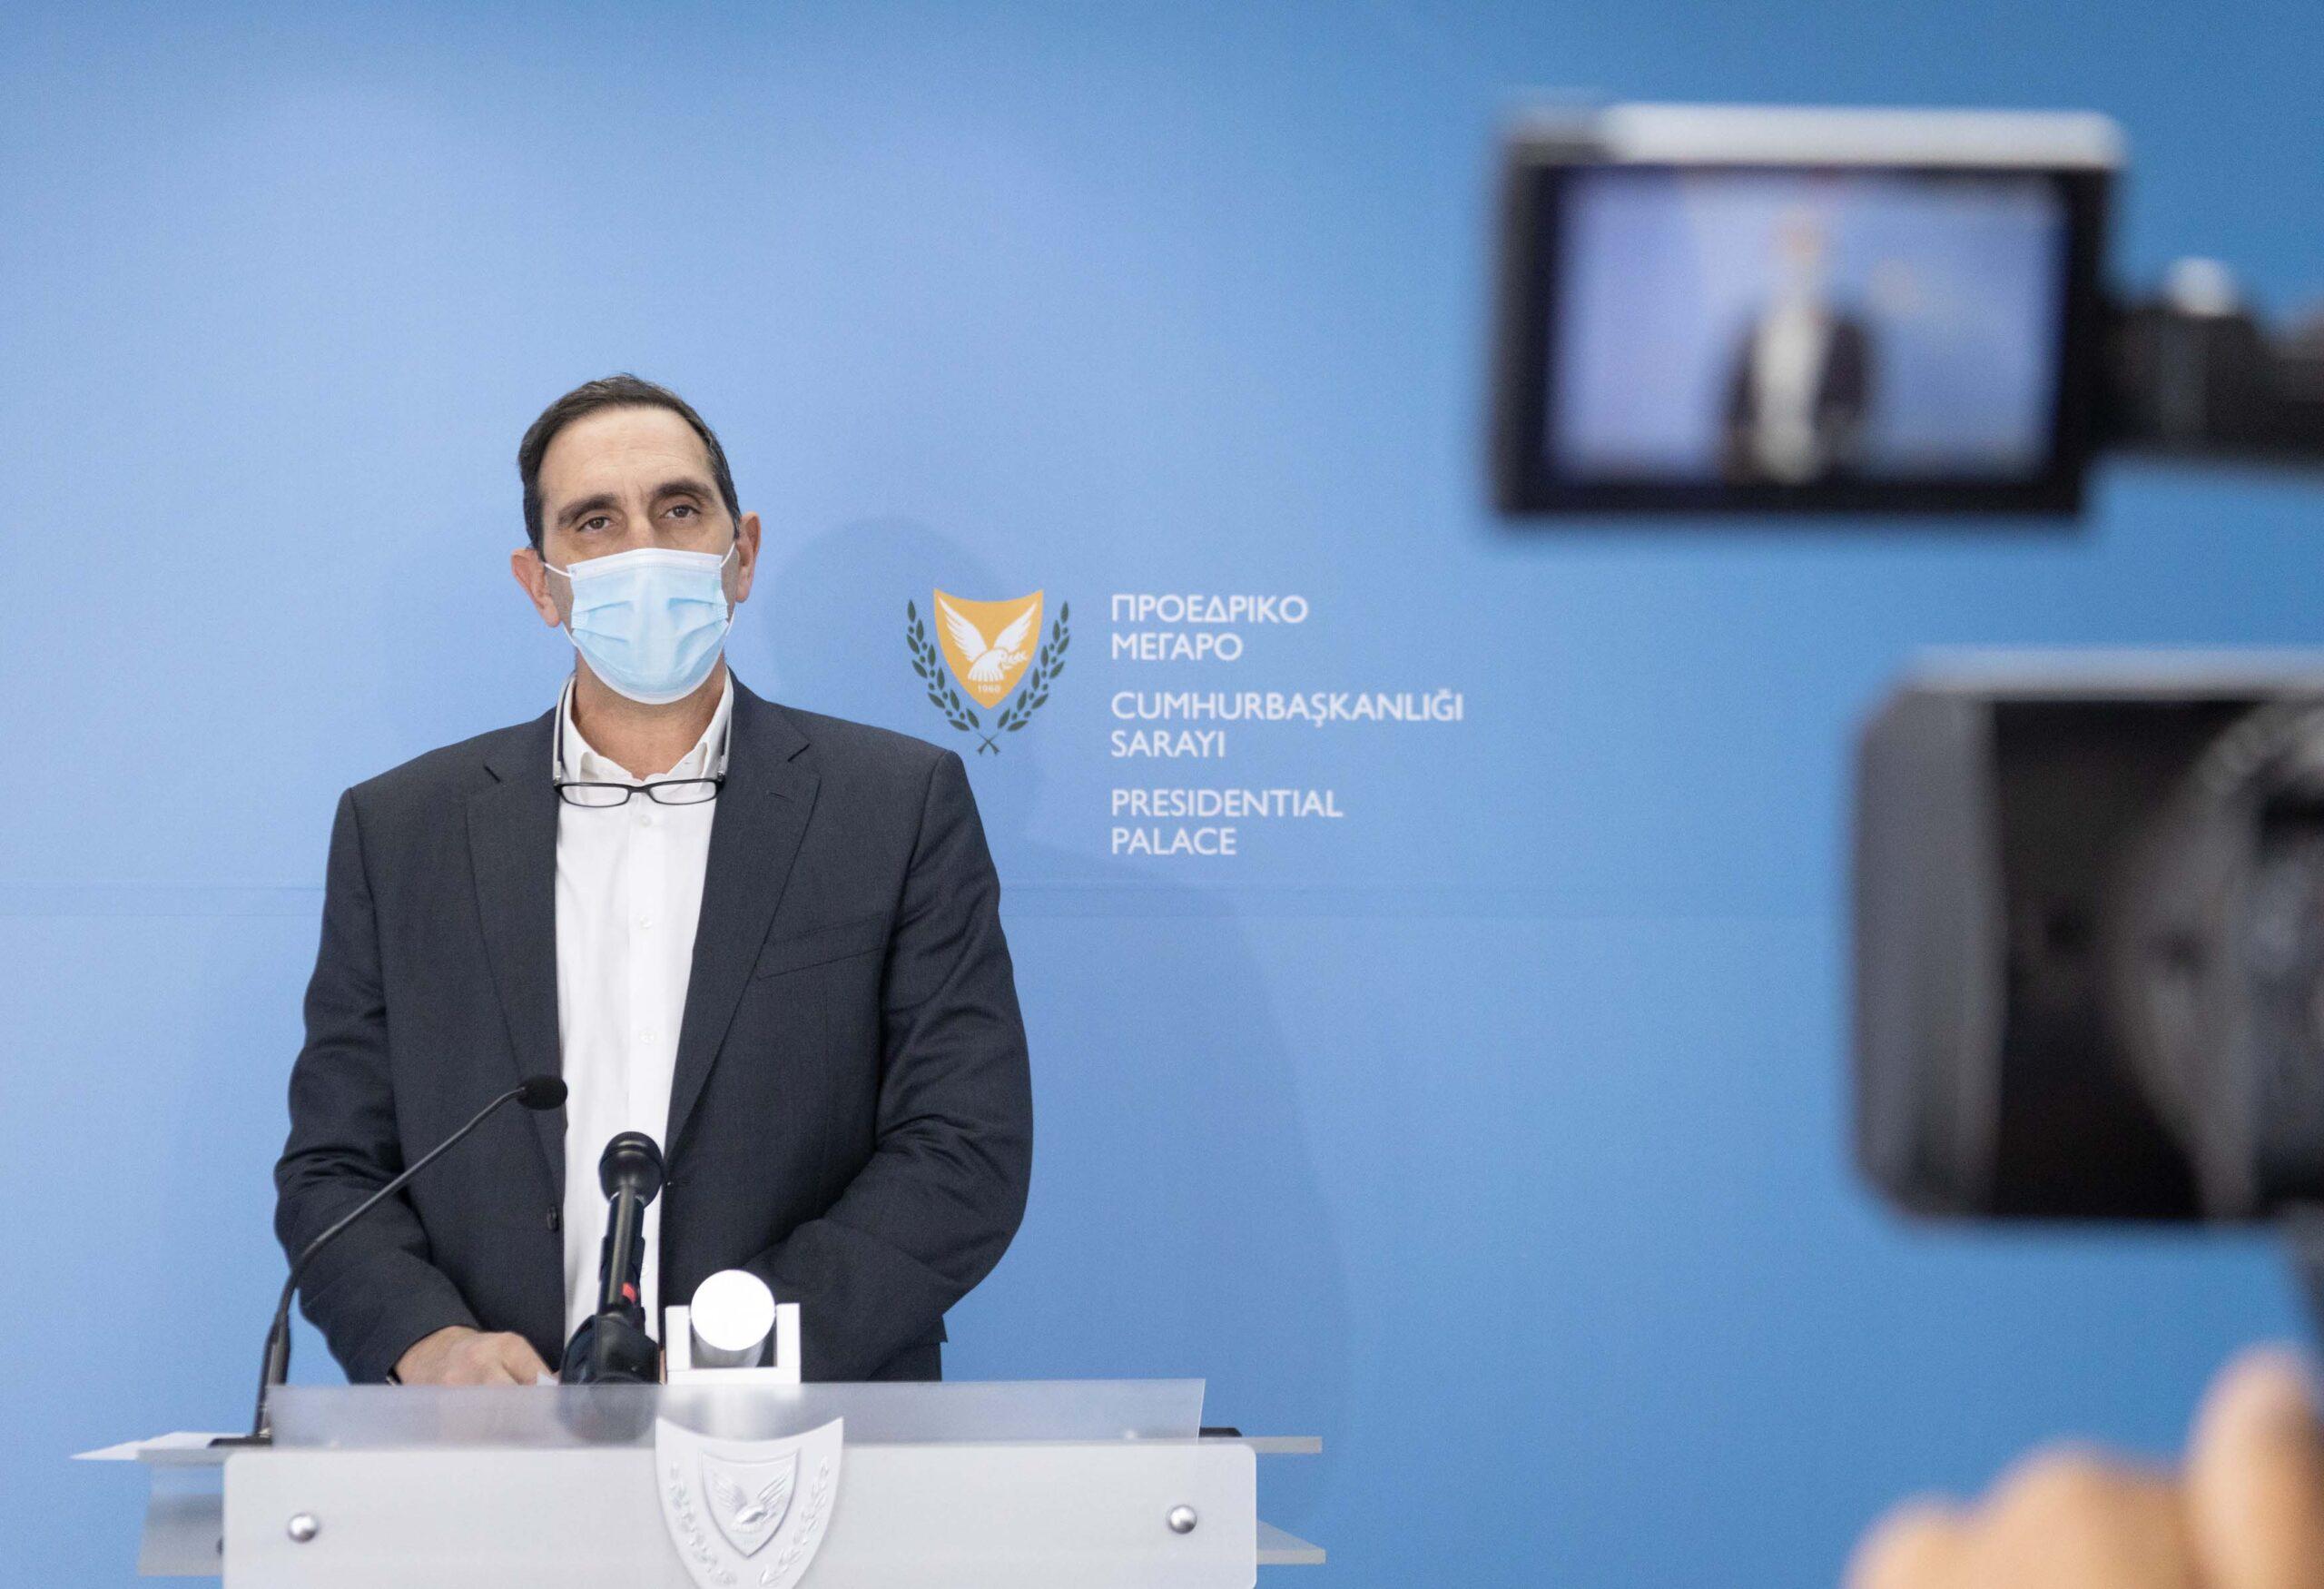 Image Coronavirus: Coronapass a temporary measure, health minister says | Cyprus Mail